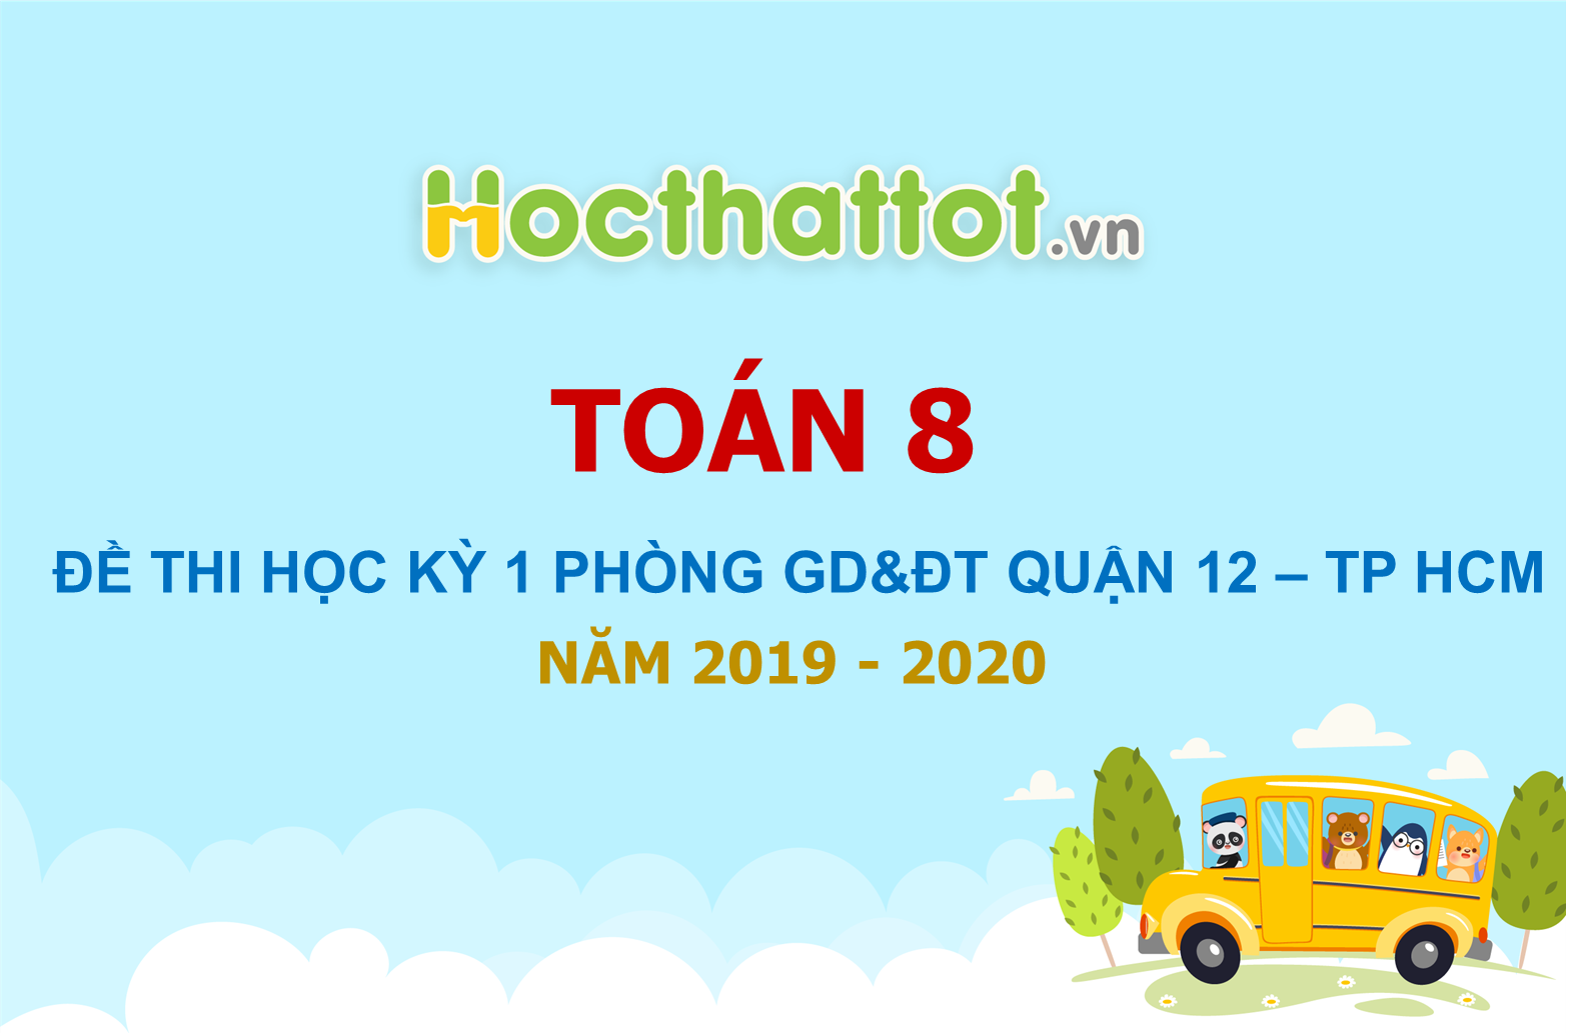 de-thi-hoc-ky-1-toan-8-nam-2019-2020-phong-gddt-quan-12-tp-hcm